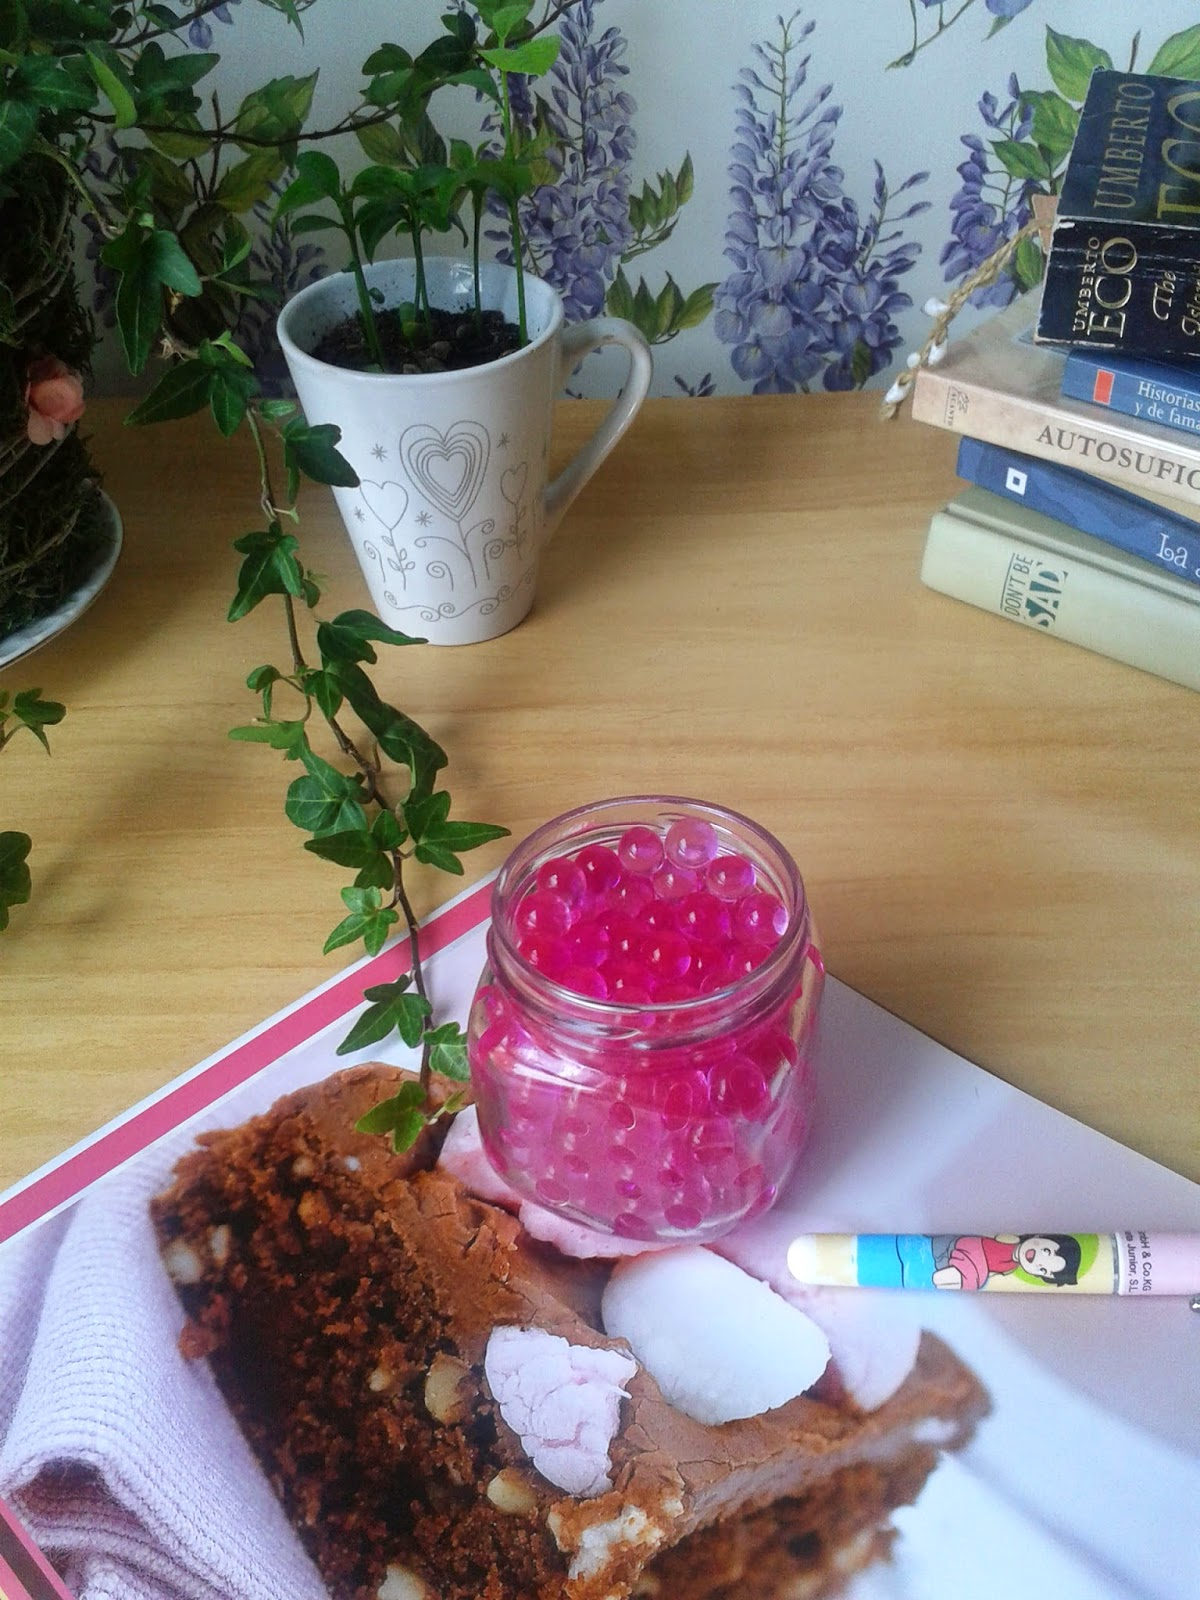 rose scented homemade air freshener